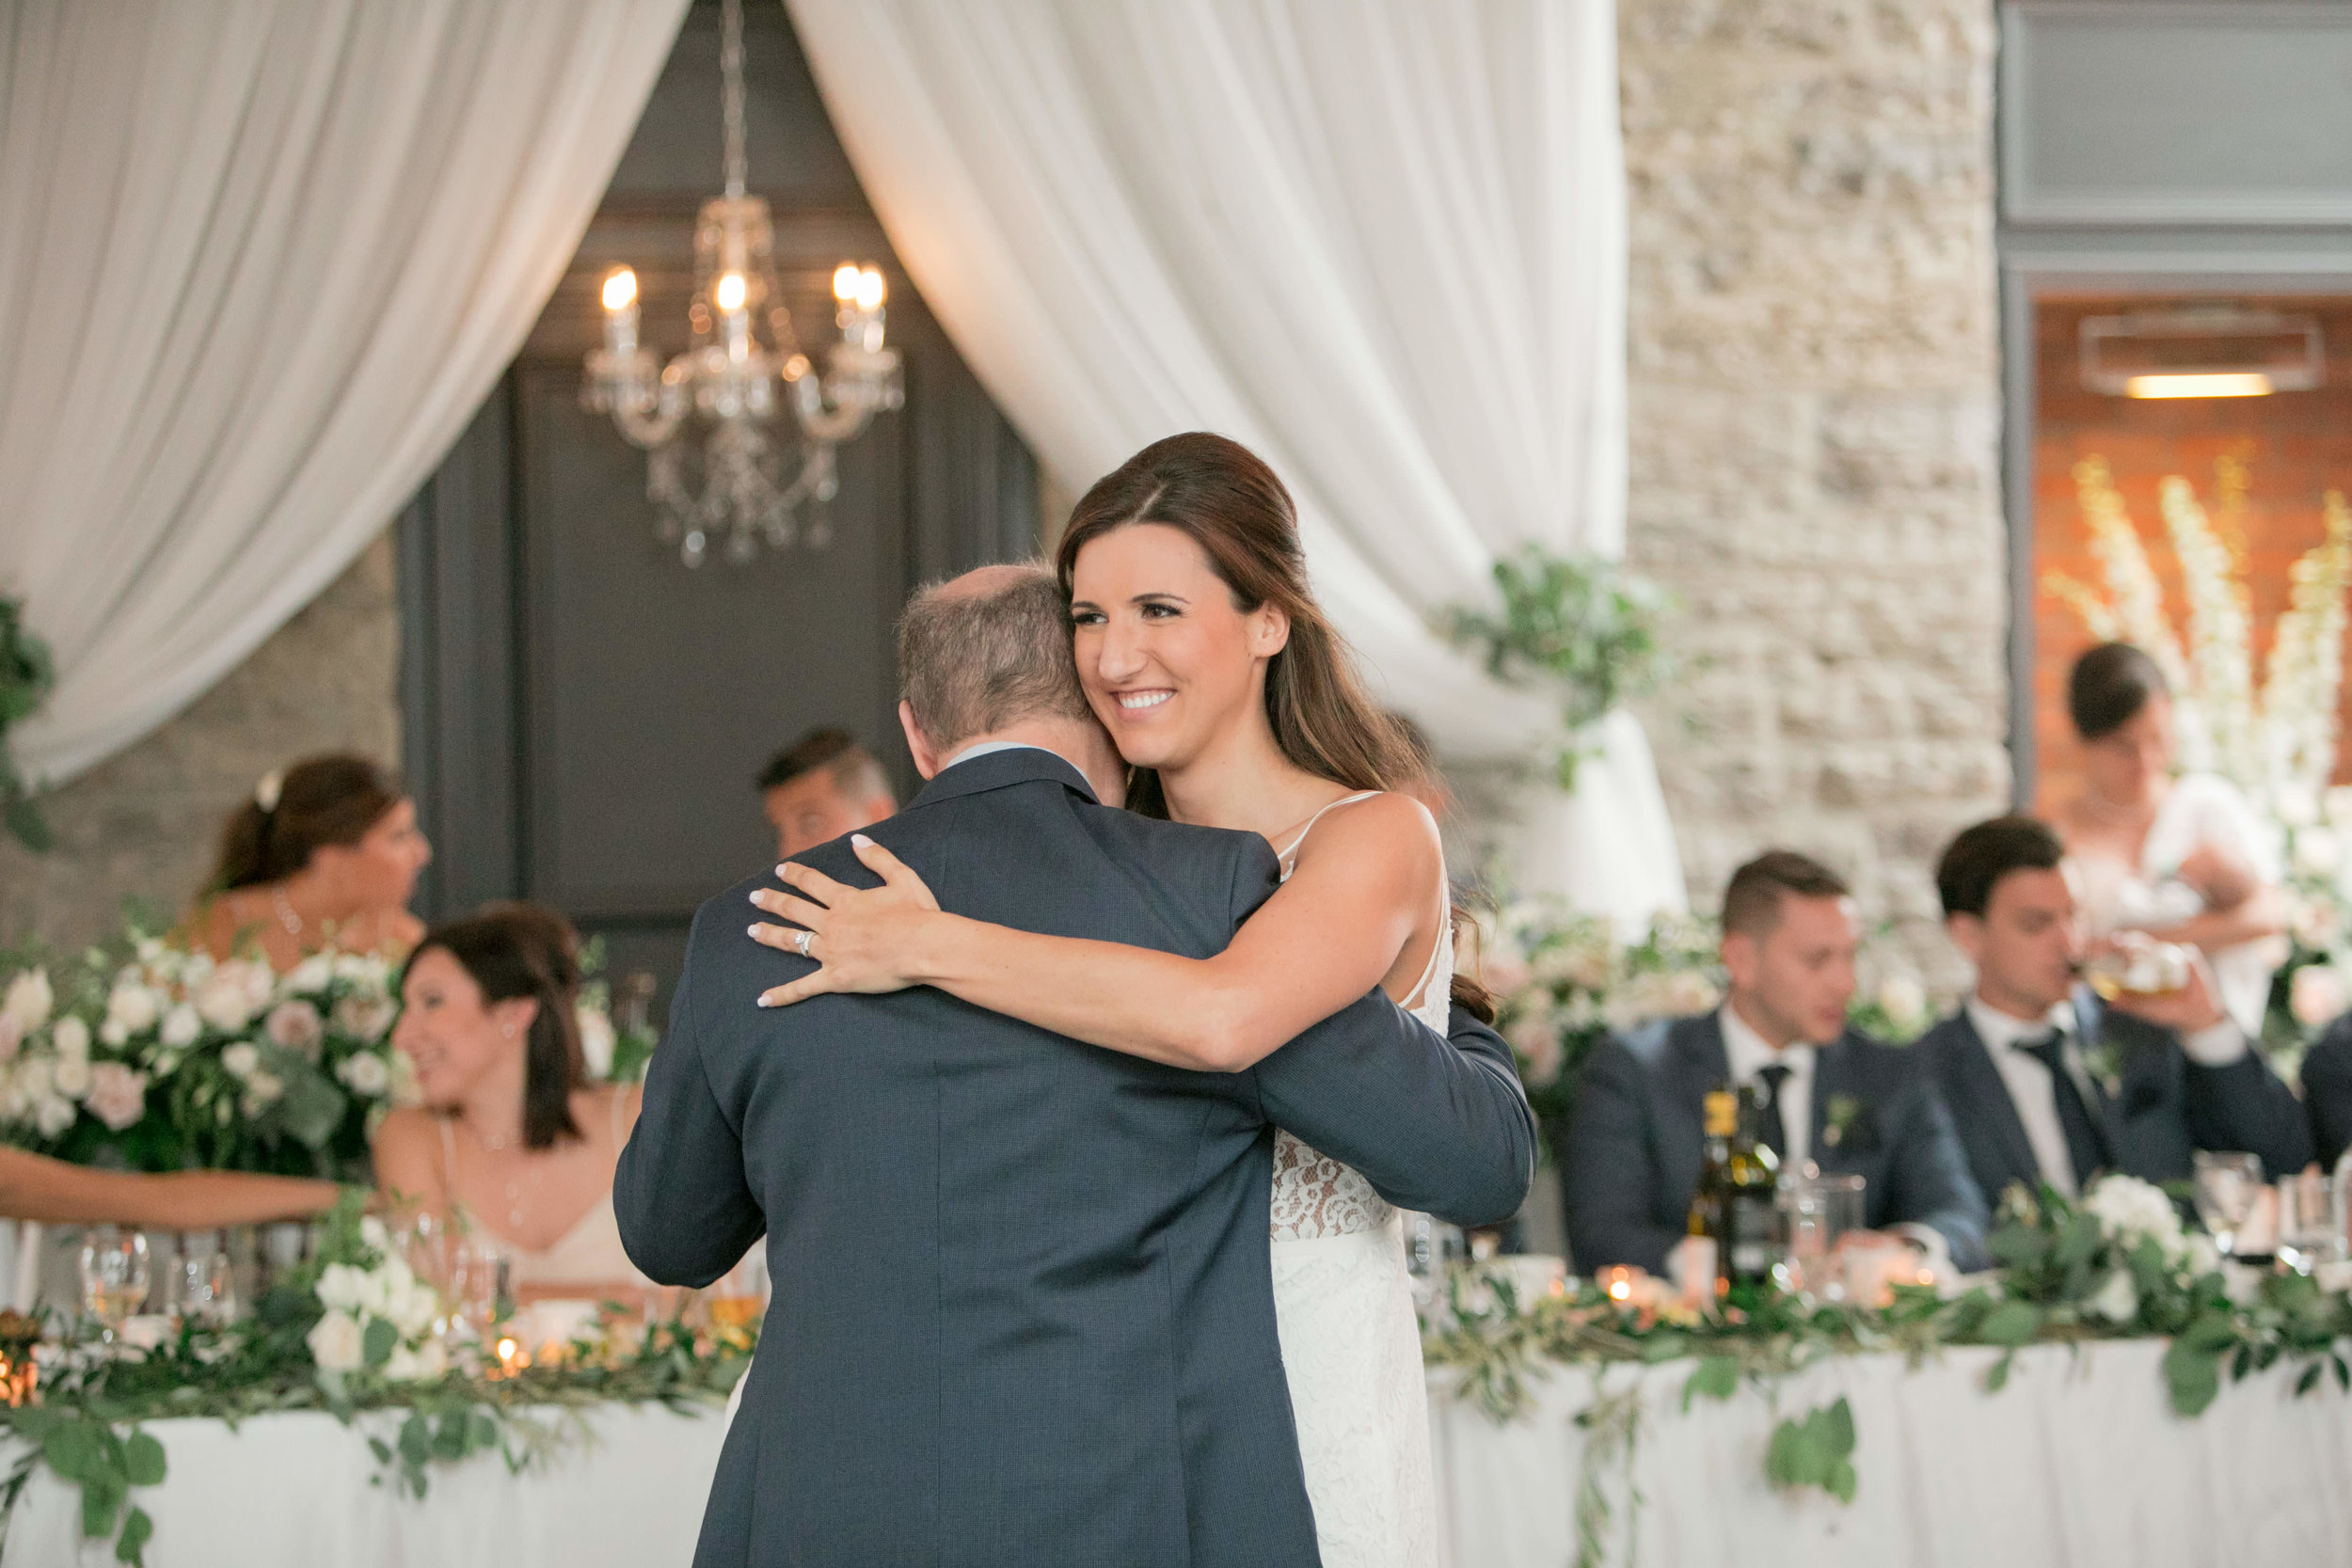 Miranda___Daniel___Daniel_Ricci_Weddings___High_Res._Finals_590.jpg